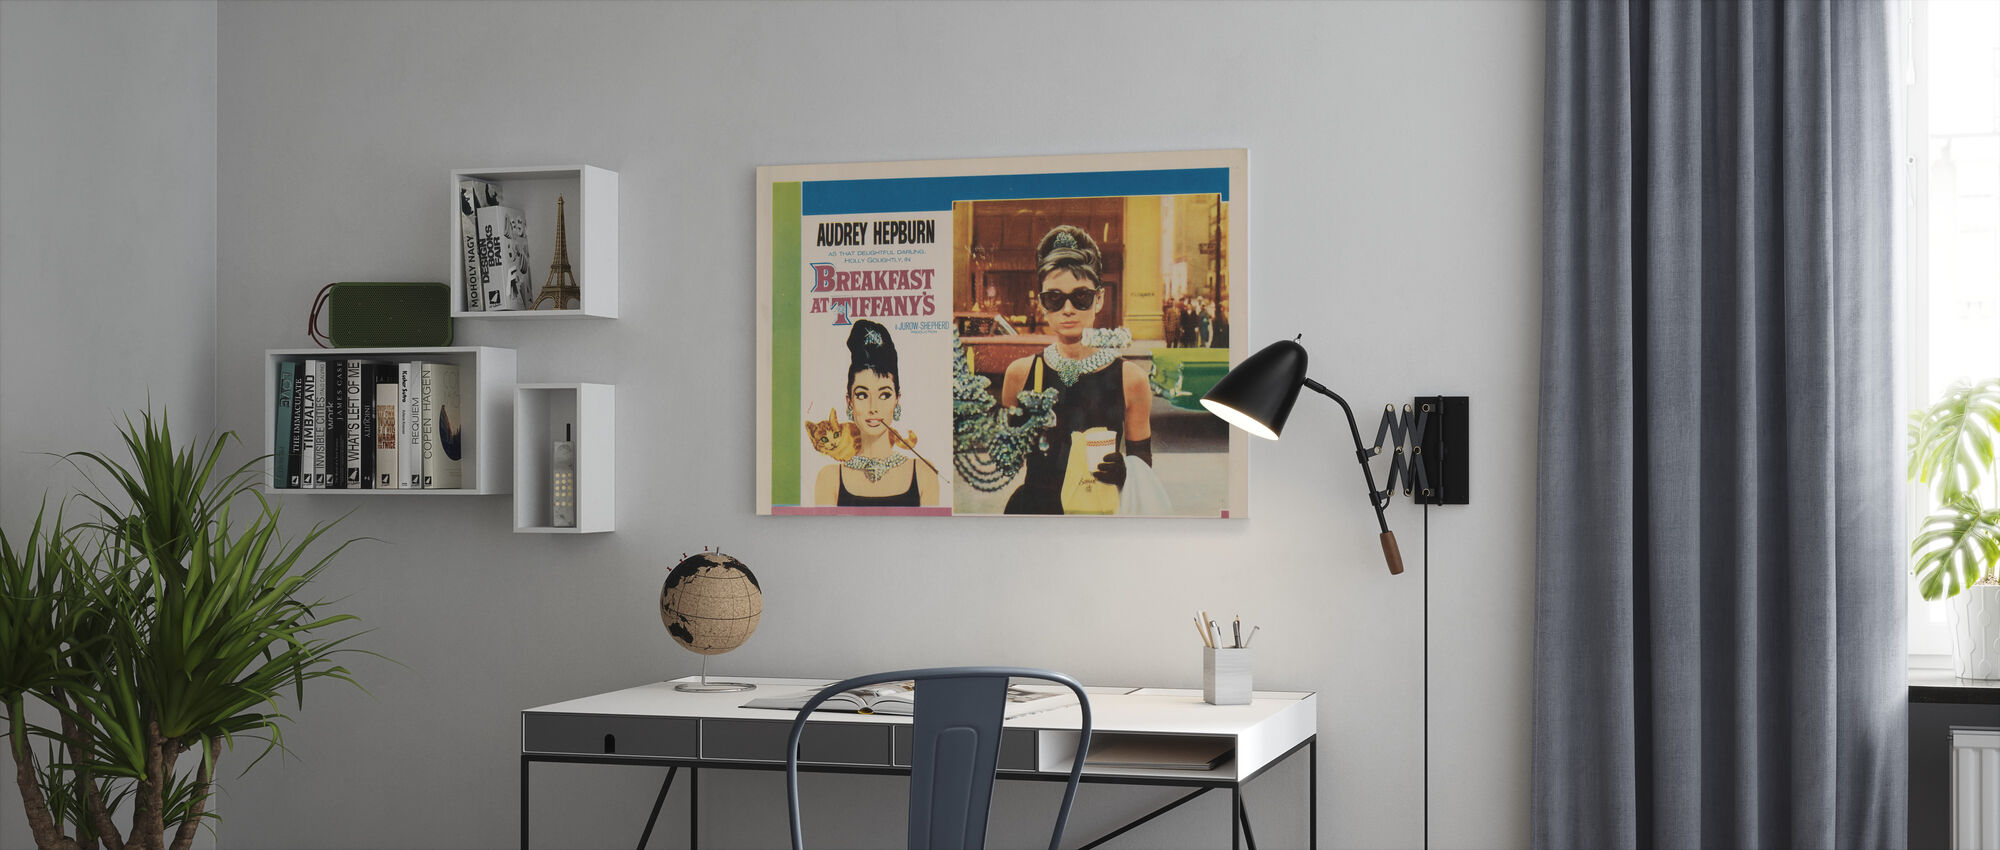 Film affisch Frukost på Tiffany's - Canvastavla - Kontor